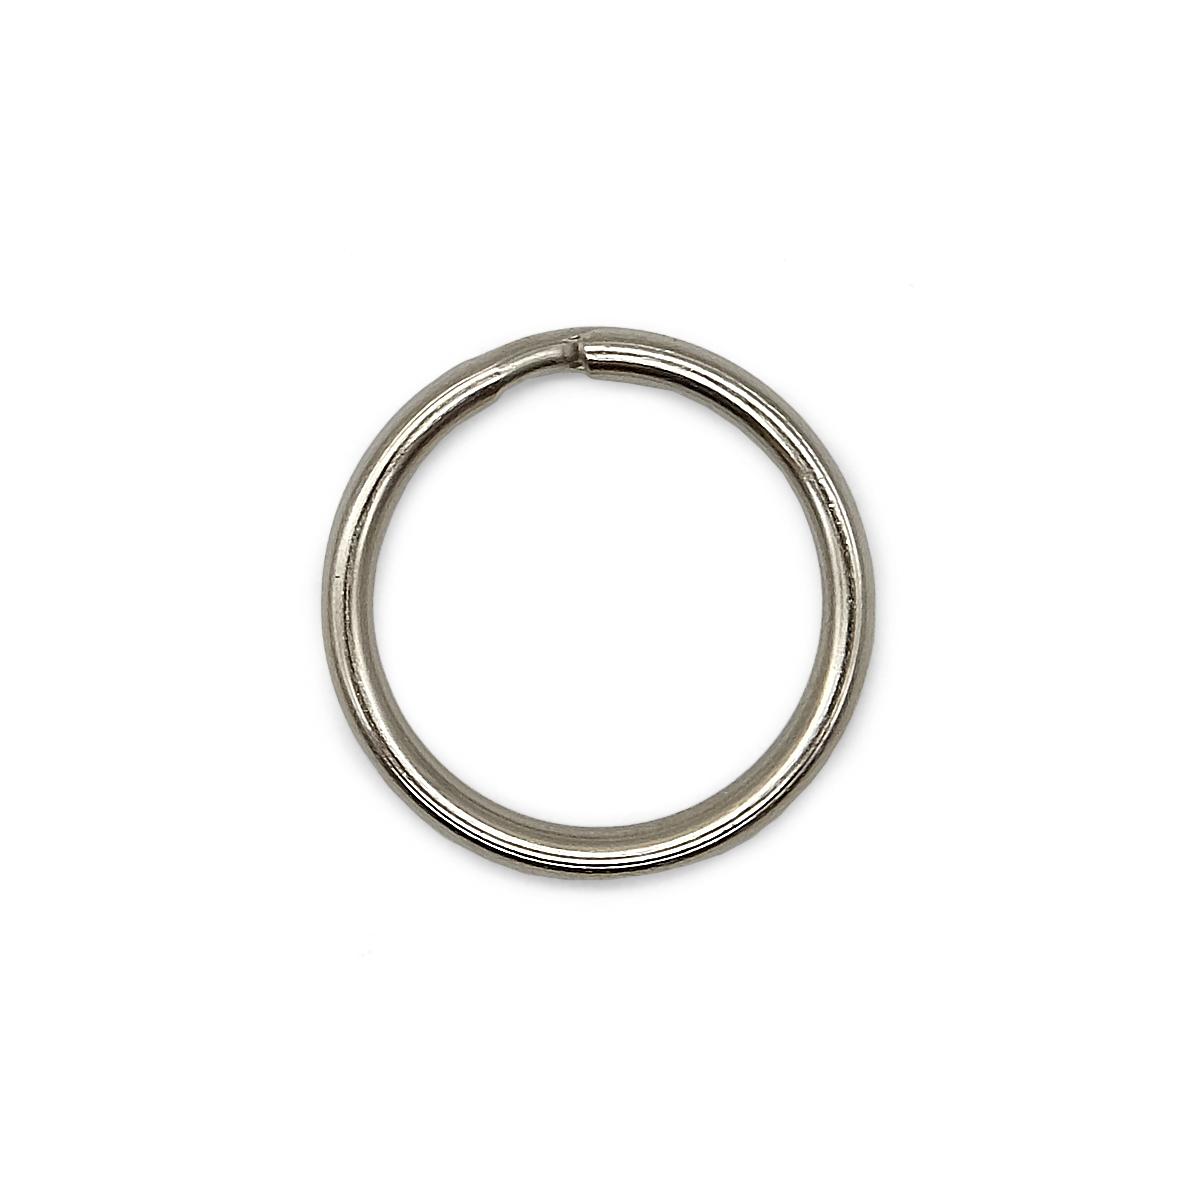 Кольцо для ключей 815-001, d=25*4мм, никель